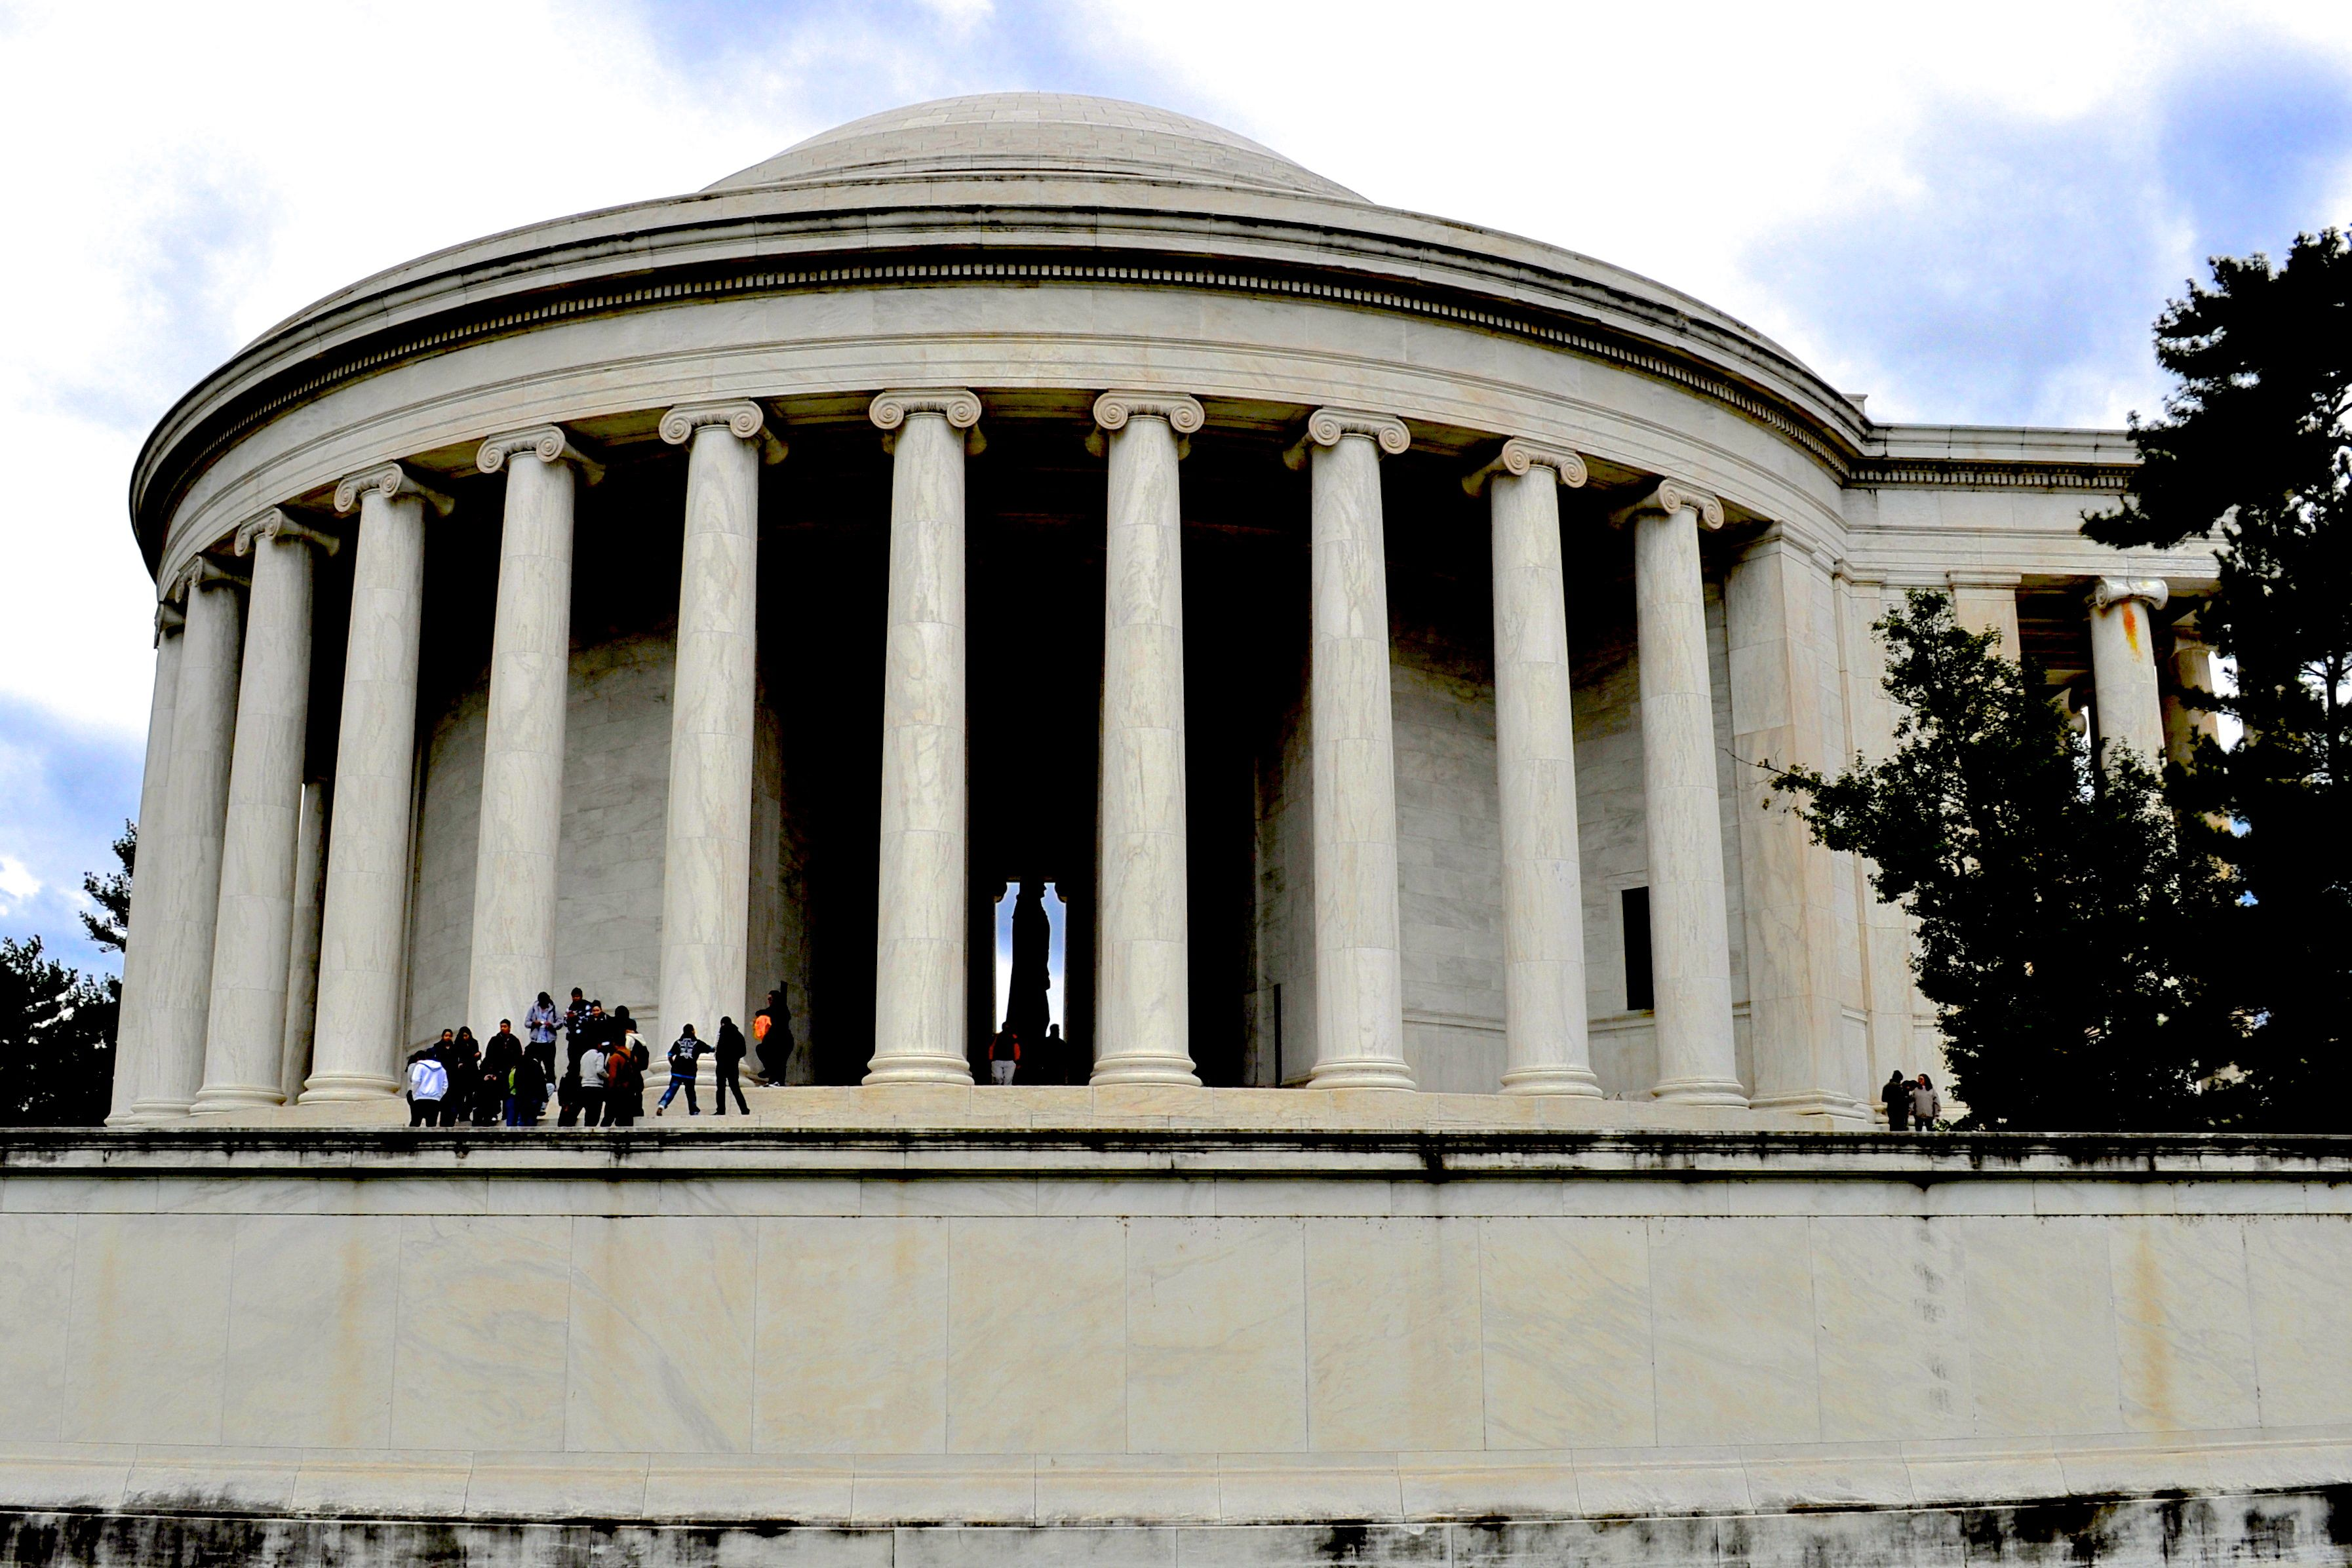 Thomas Jefferson Memorial Side View 1 - Johnson-Miles photo